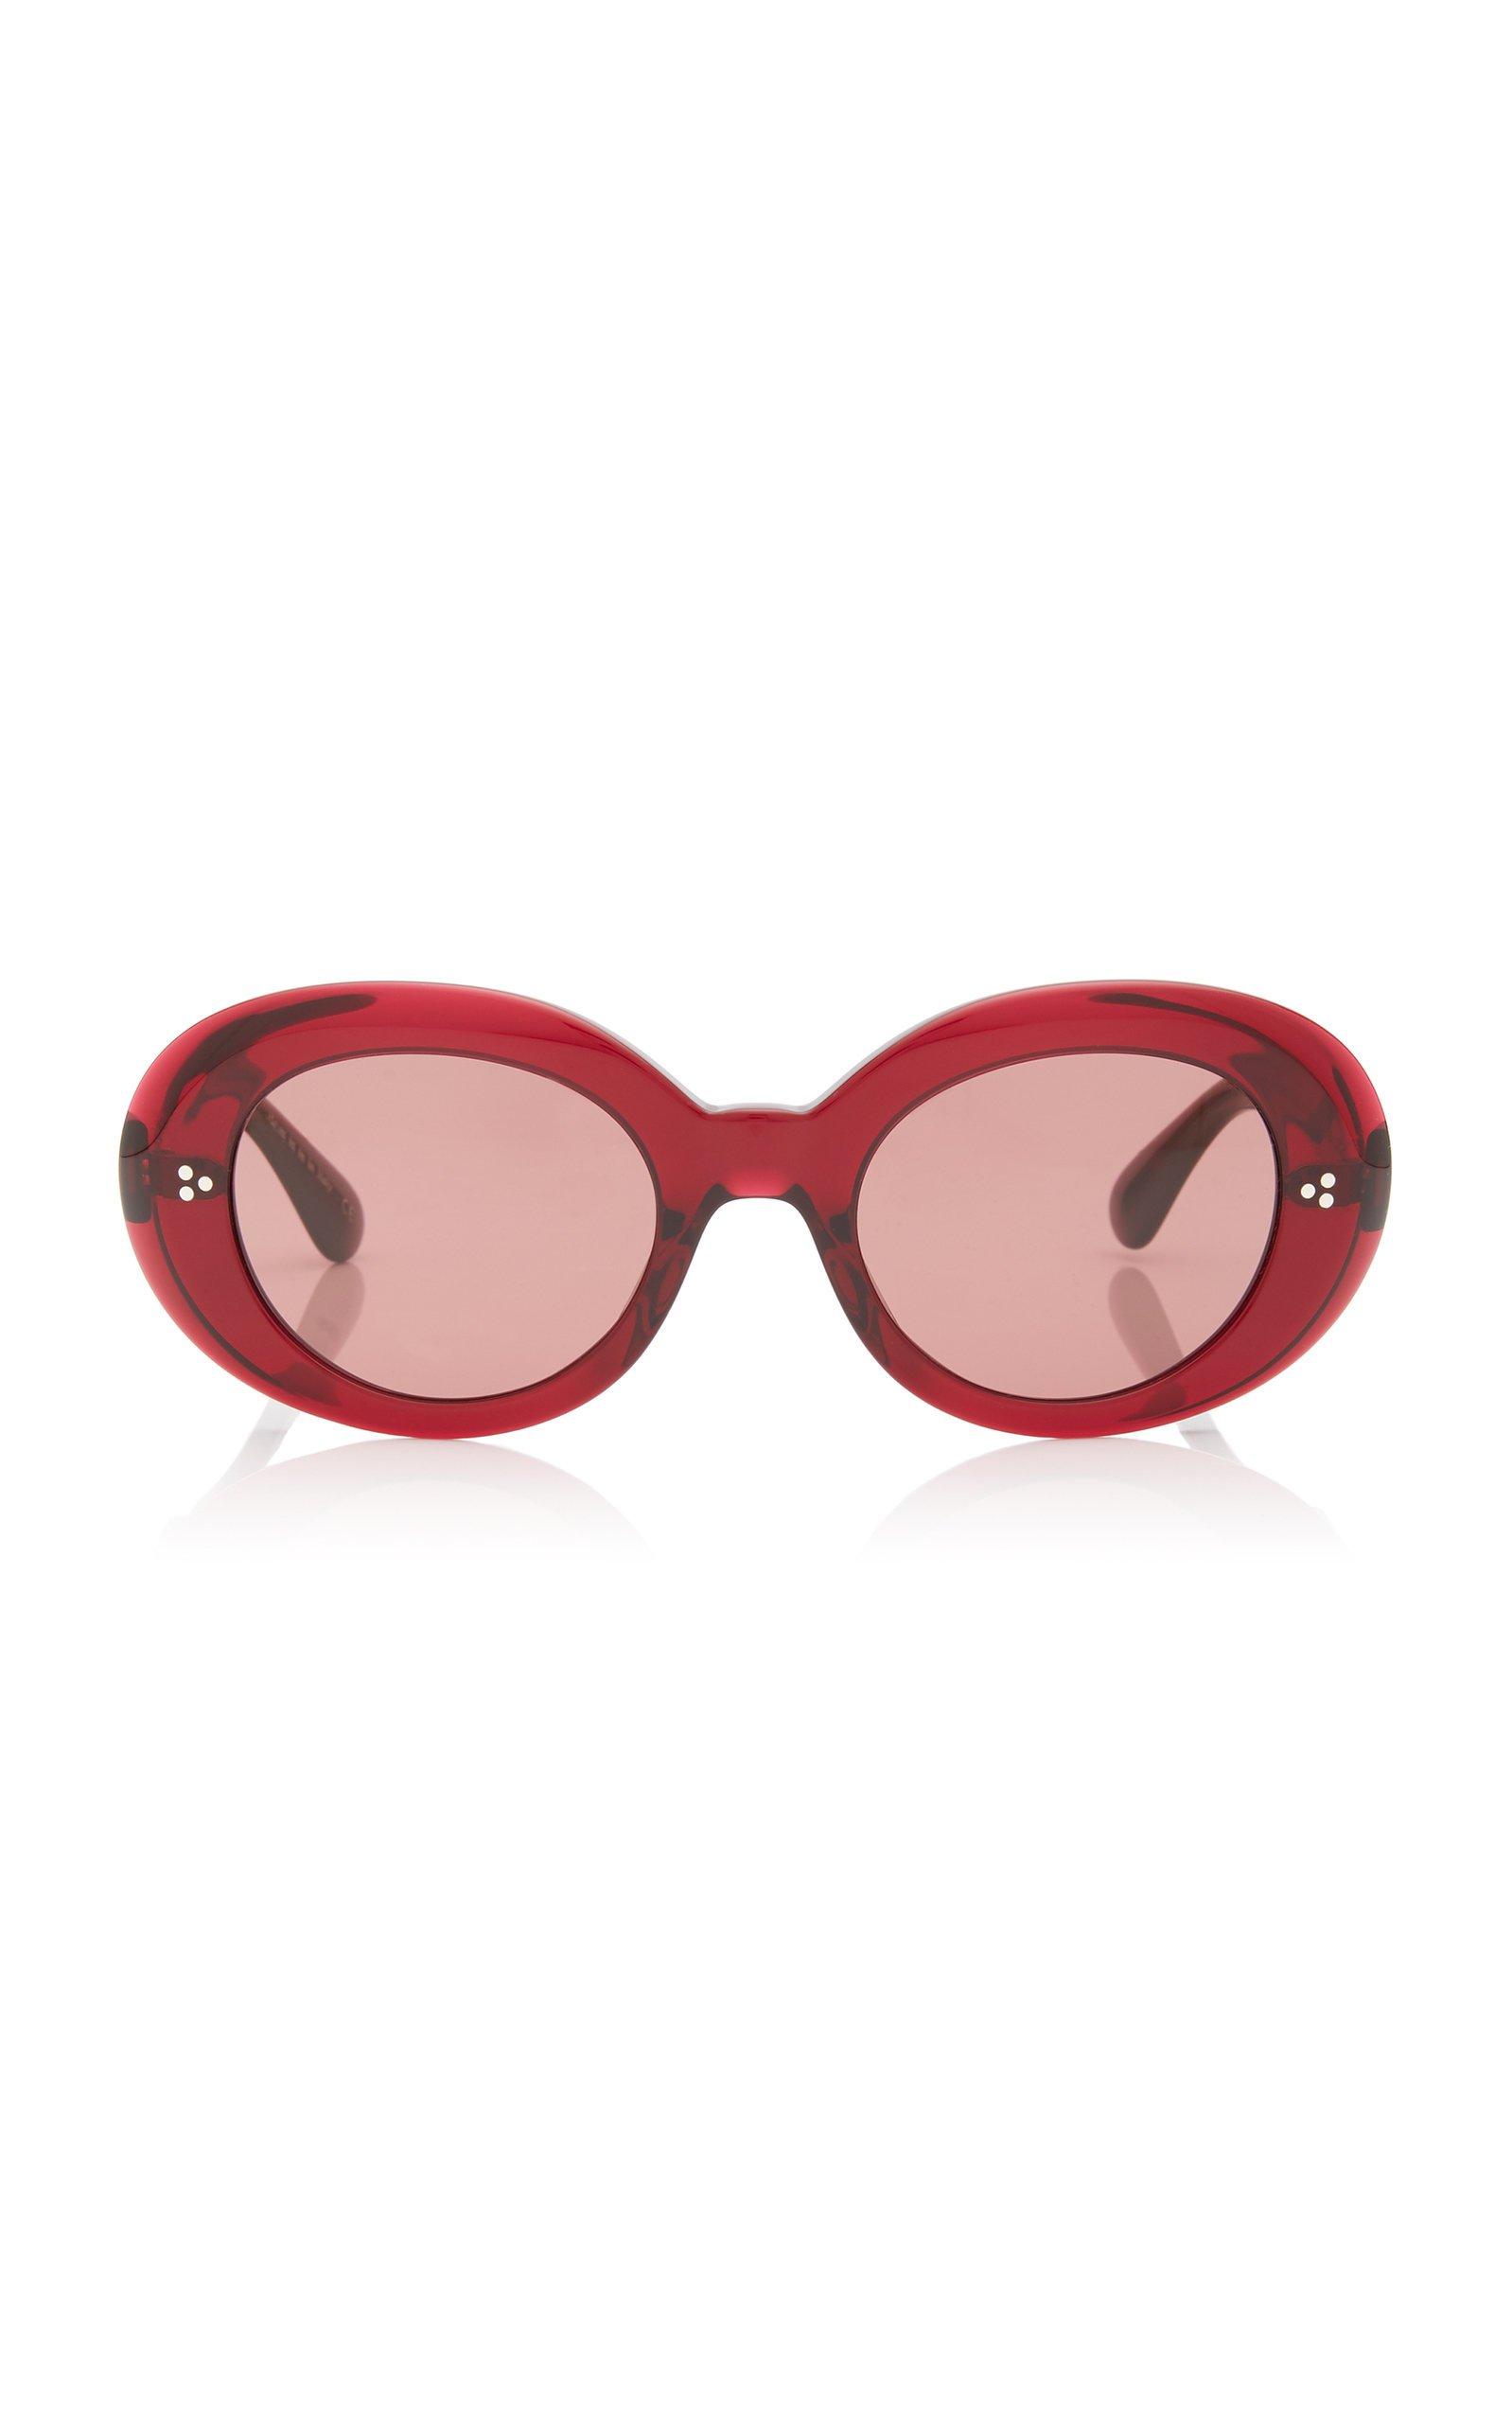 Erissa Round-Frame Acetate Sunglasses by Oliver Peoples | Moda Operandi